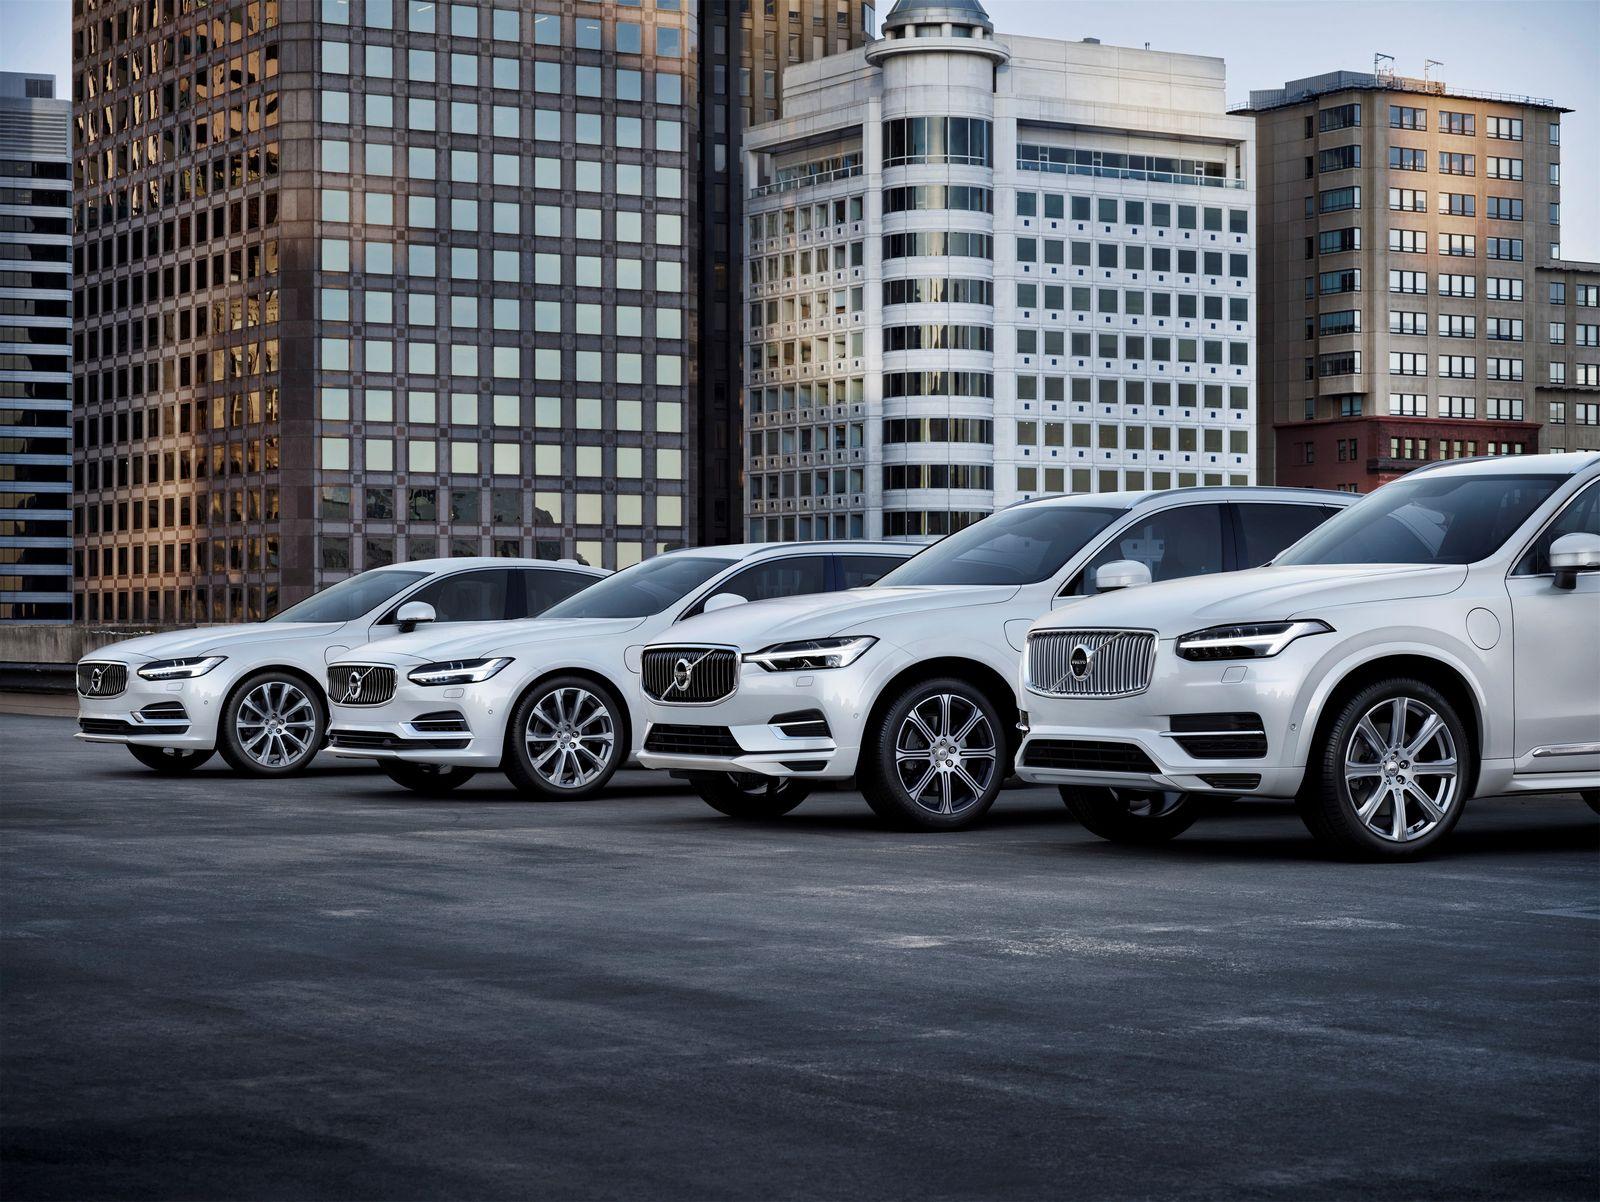 Photo of 2019'da tüm Volvo modelleri elektrikli olacak